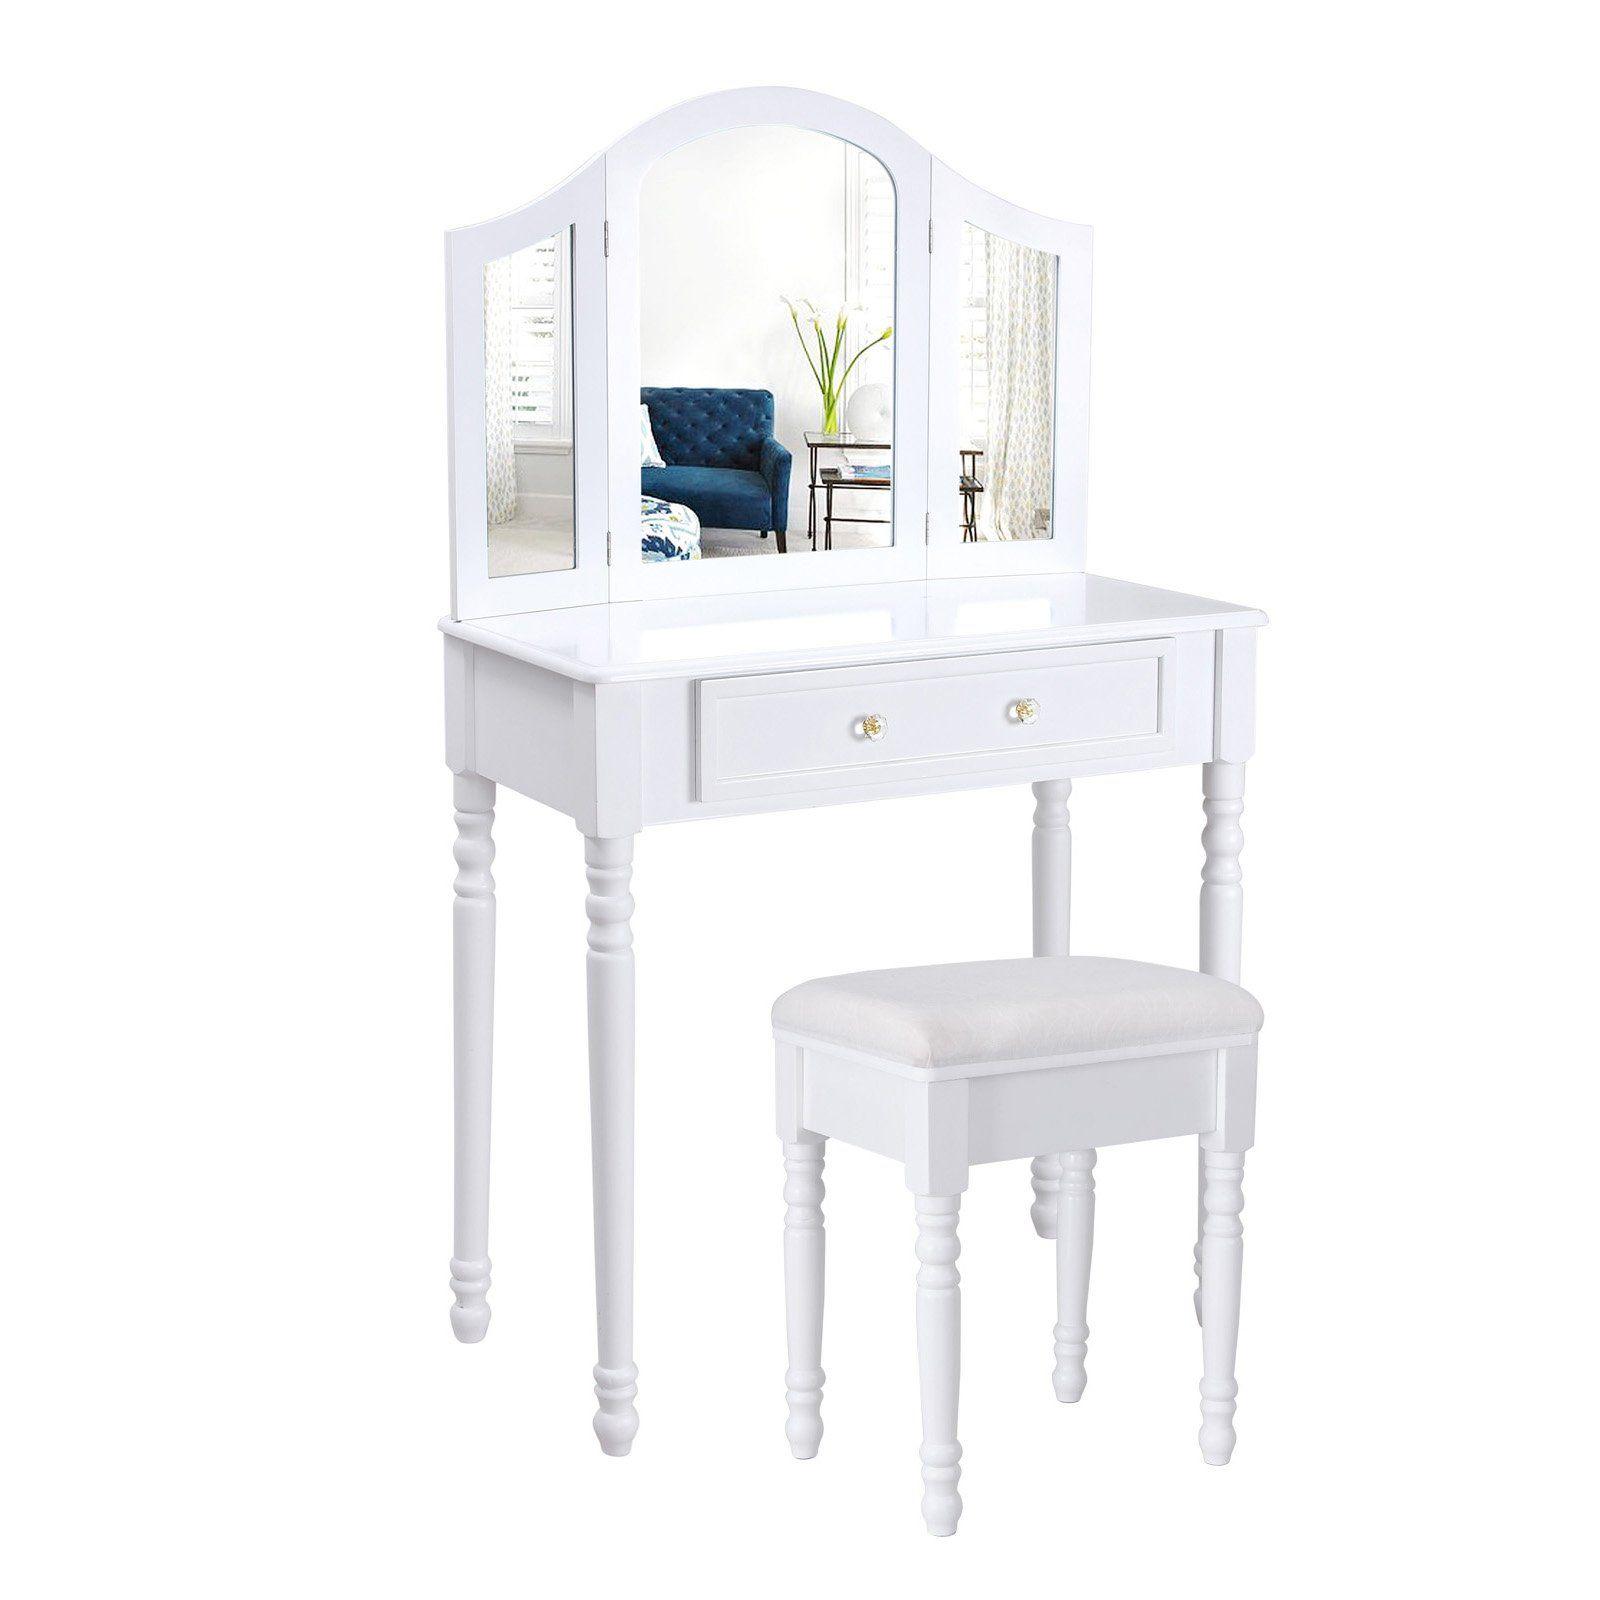 songmics schminktisch frisierkommode frisiertisch kosmetiktisch inkl hocker spiegel wei. Black Bedroom Furniture Sets. Home Design Ideas